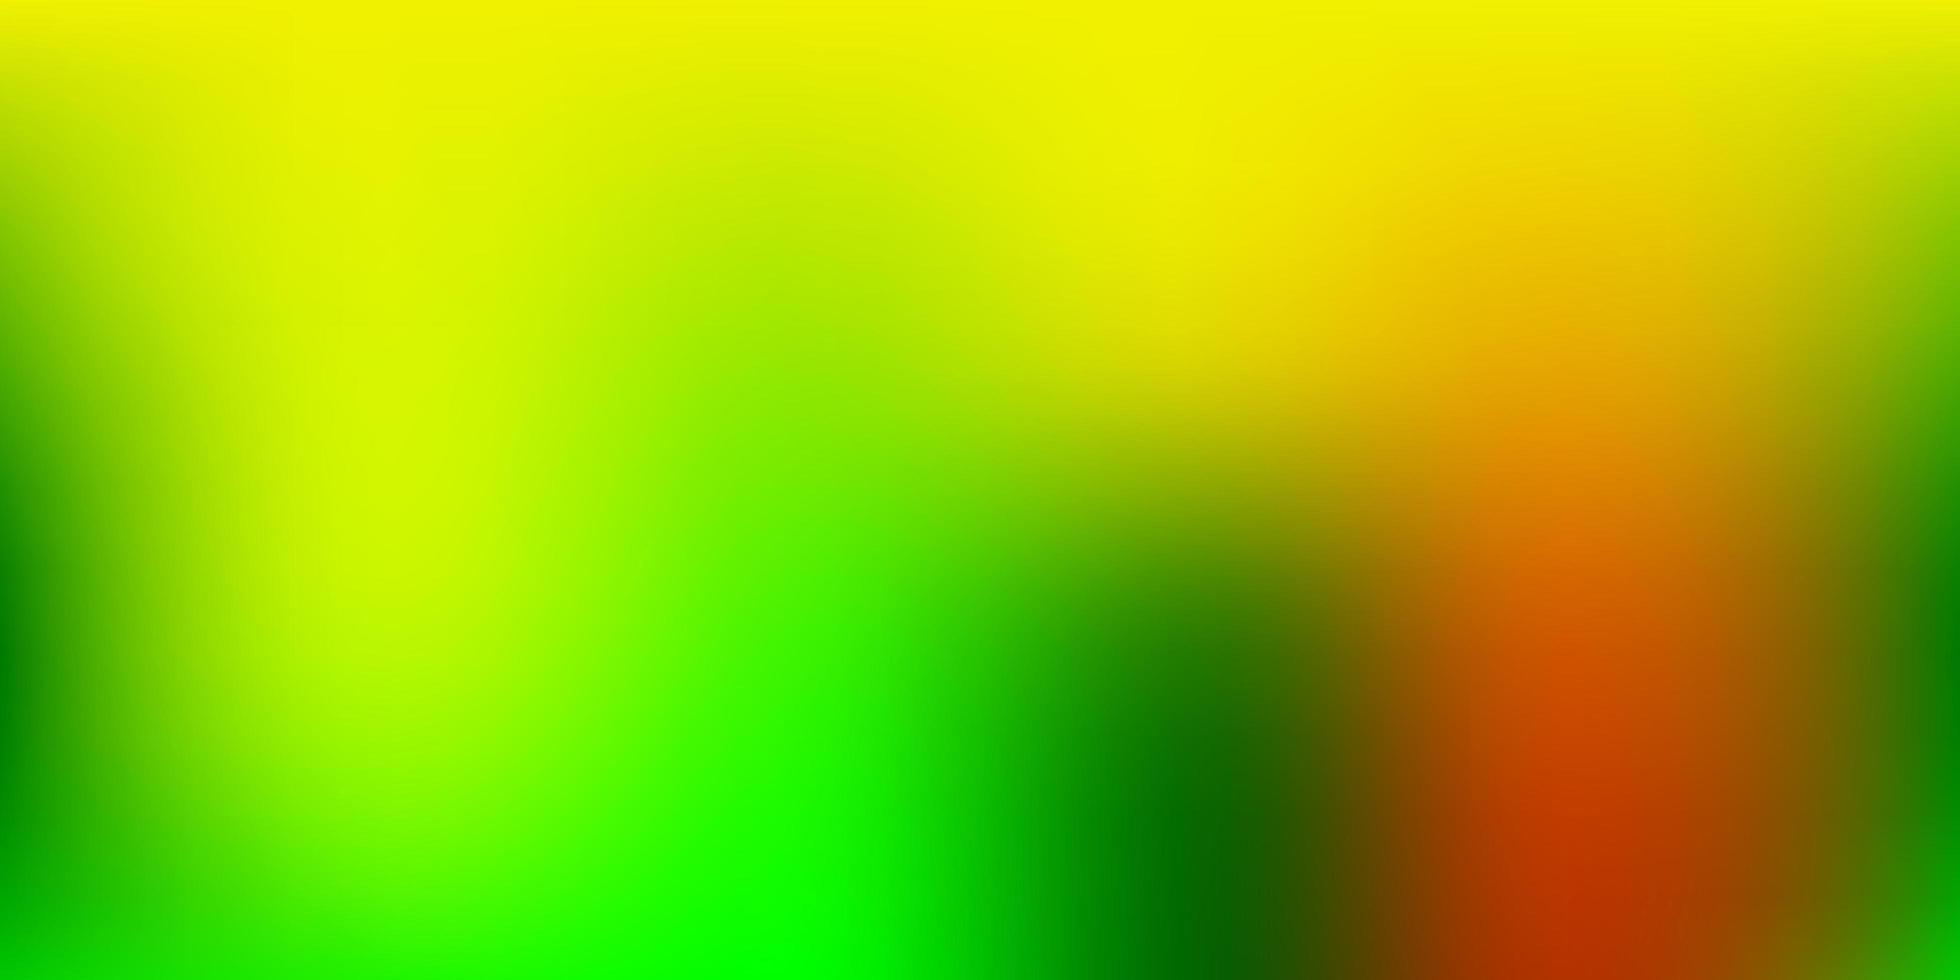 hellgrünes, gelb verschwommenes Muster. vektor